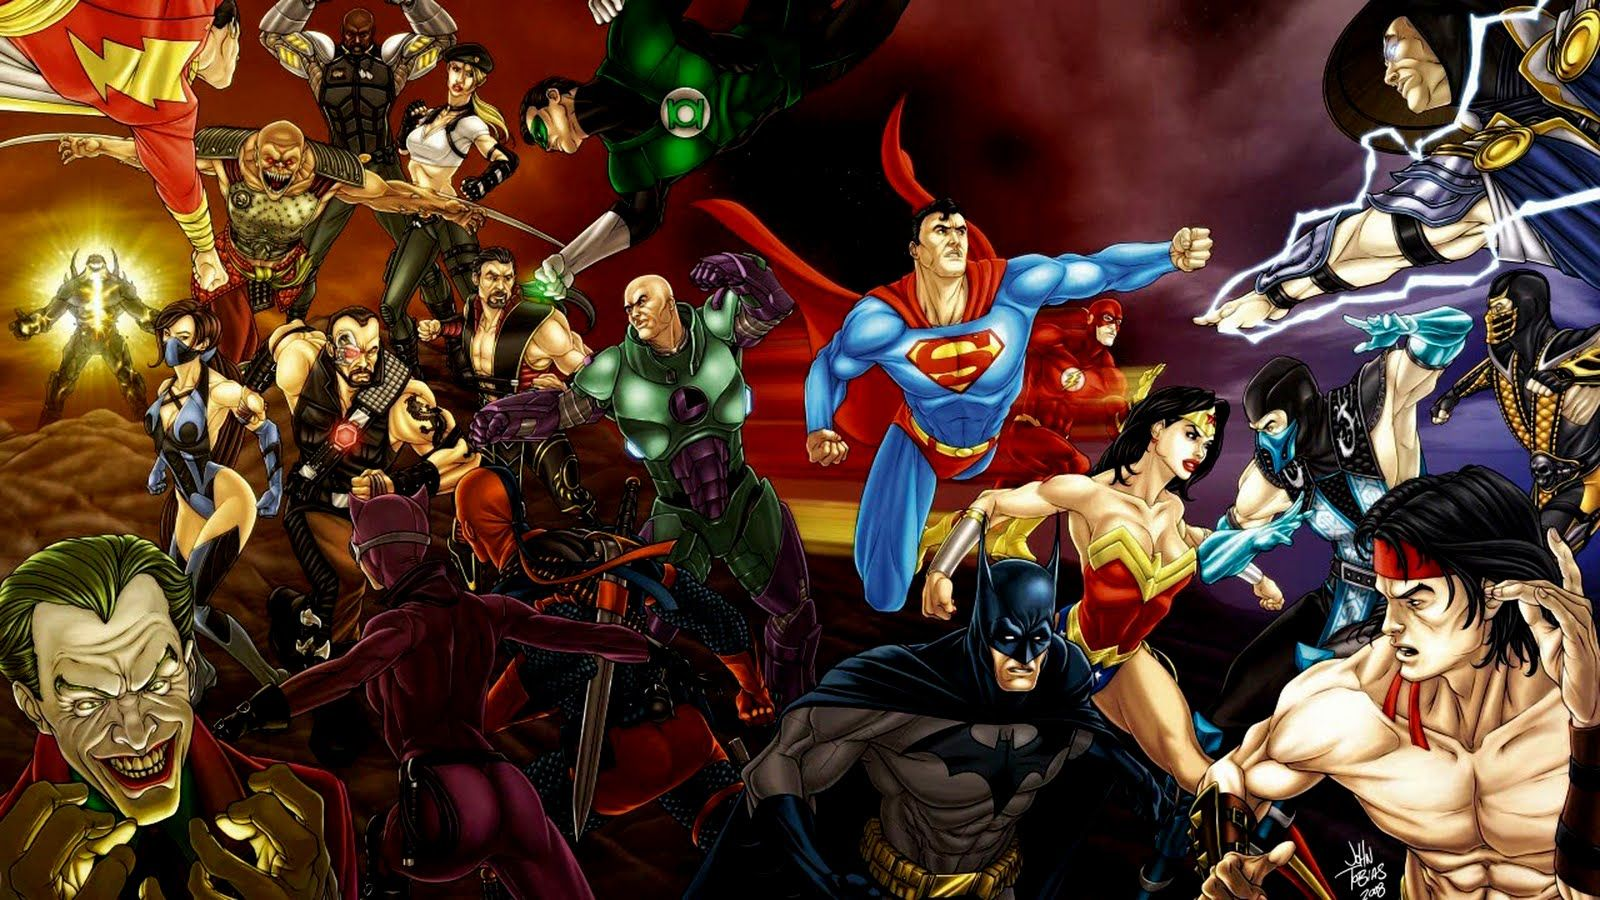 Comic Charcters Super Hero Dc Comics All Super Heroes Hd